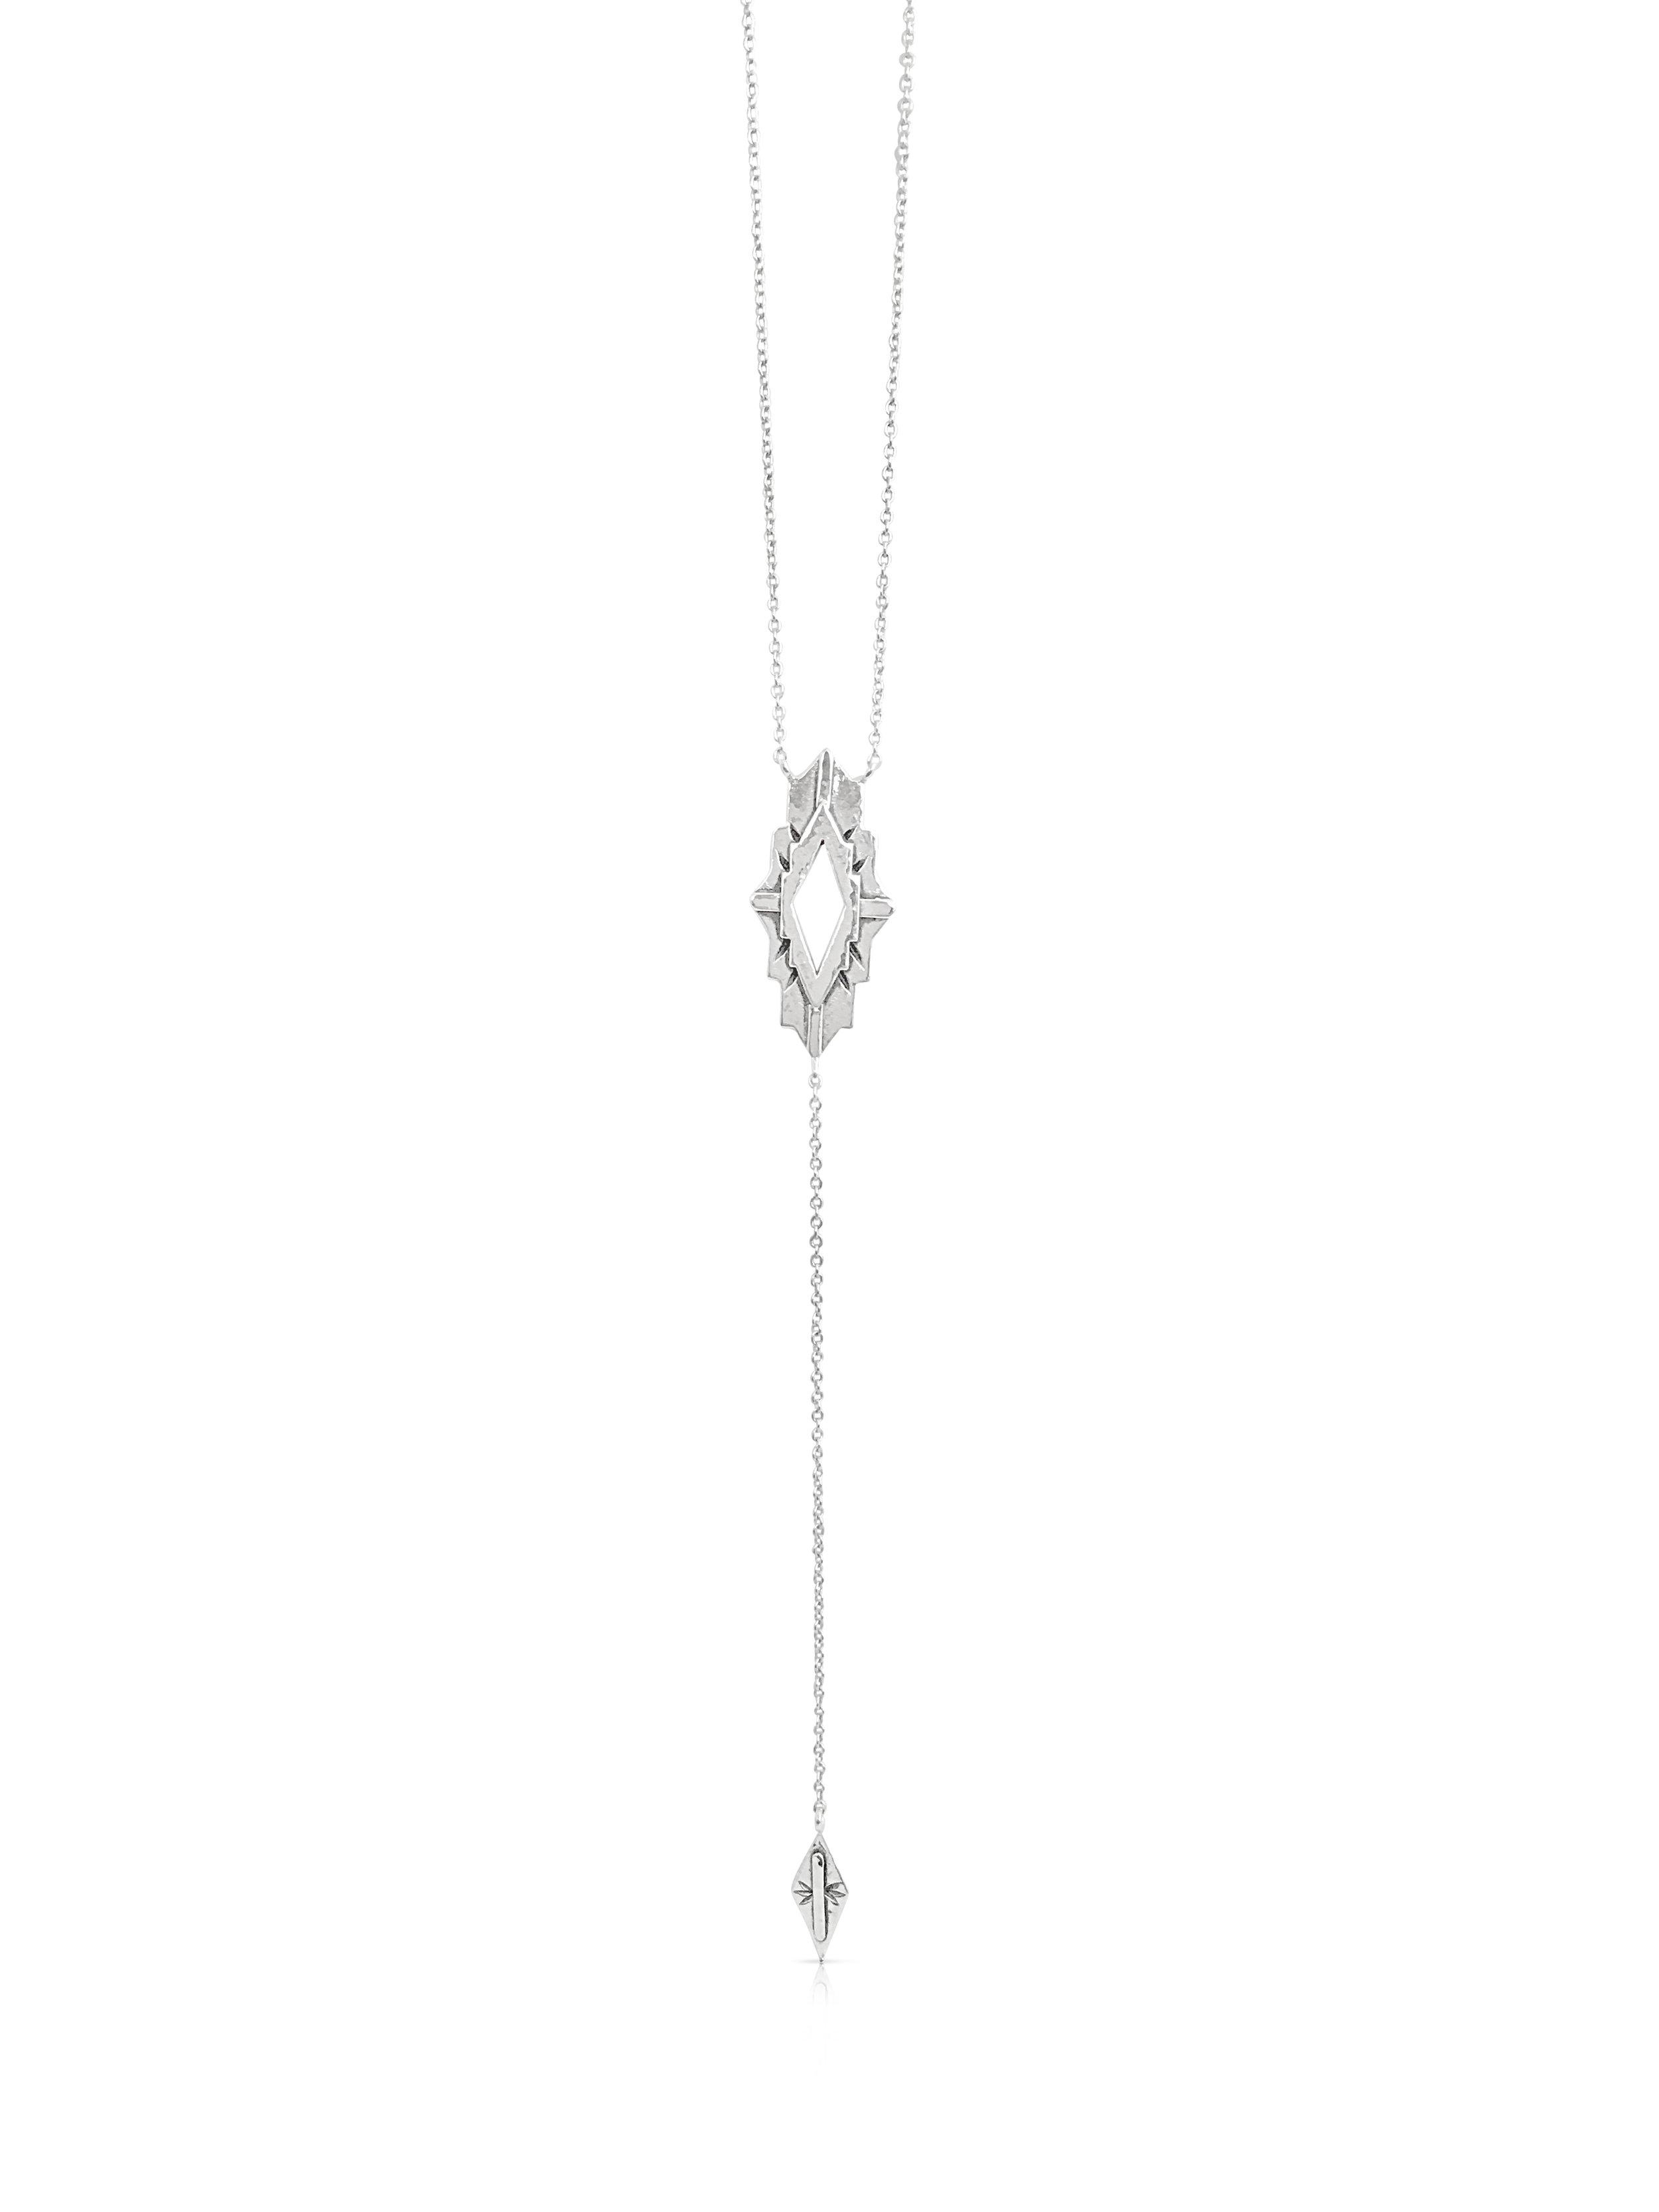 Sierra Winter Jewelry Astra Necklace.jpg